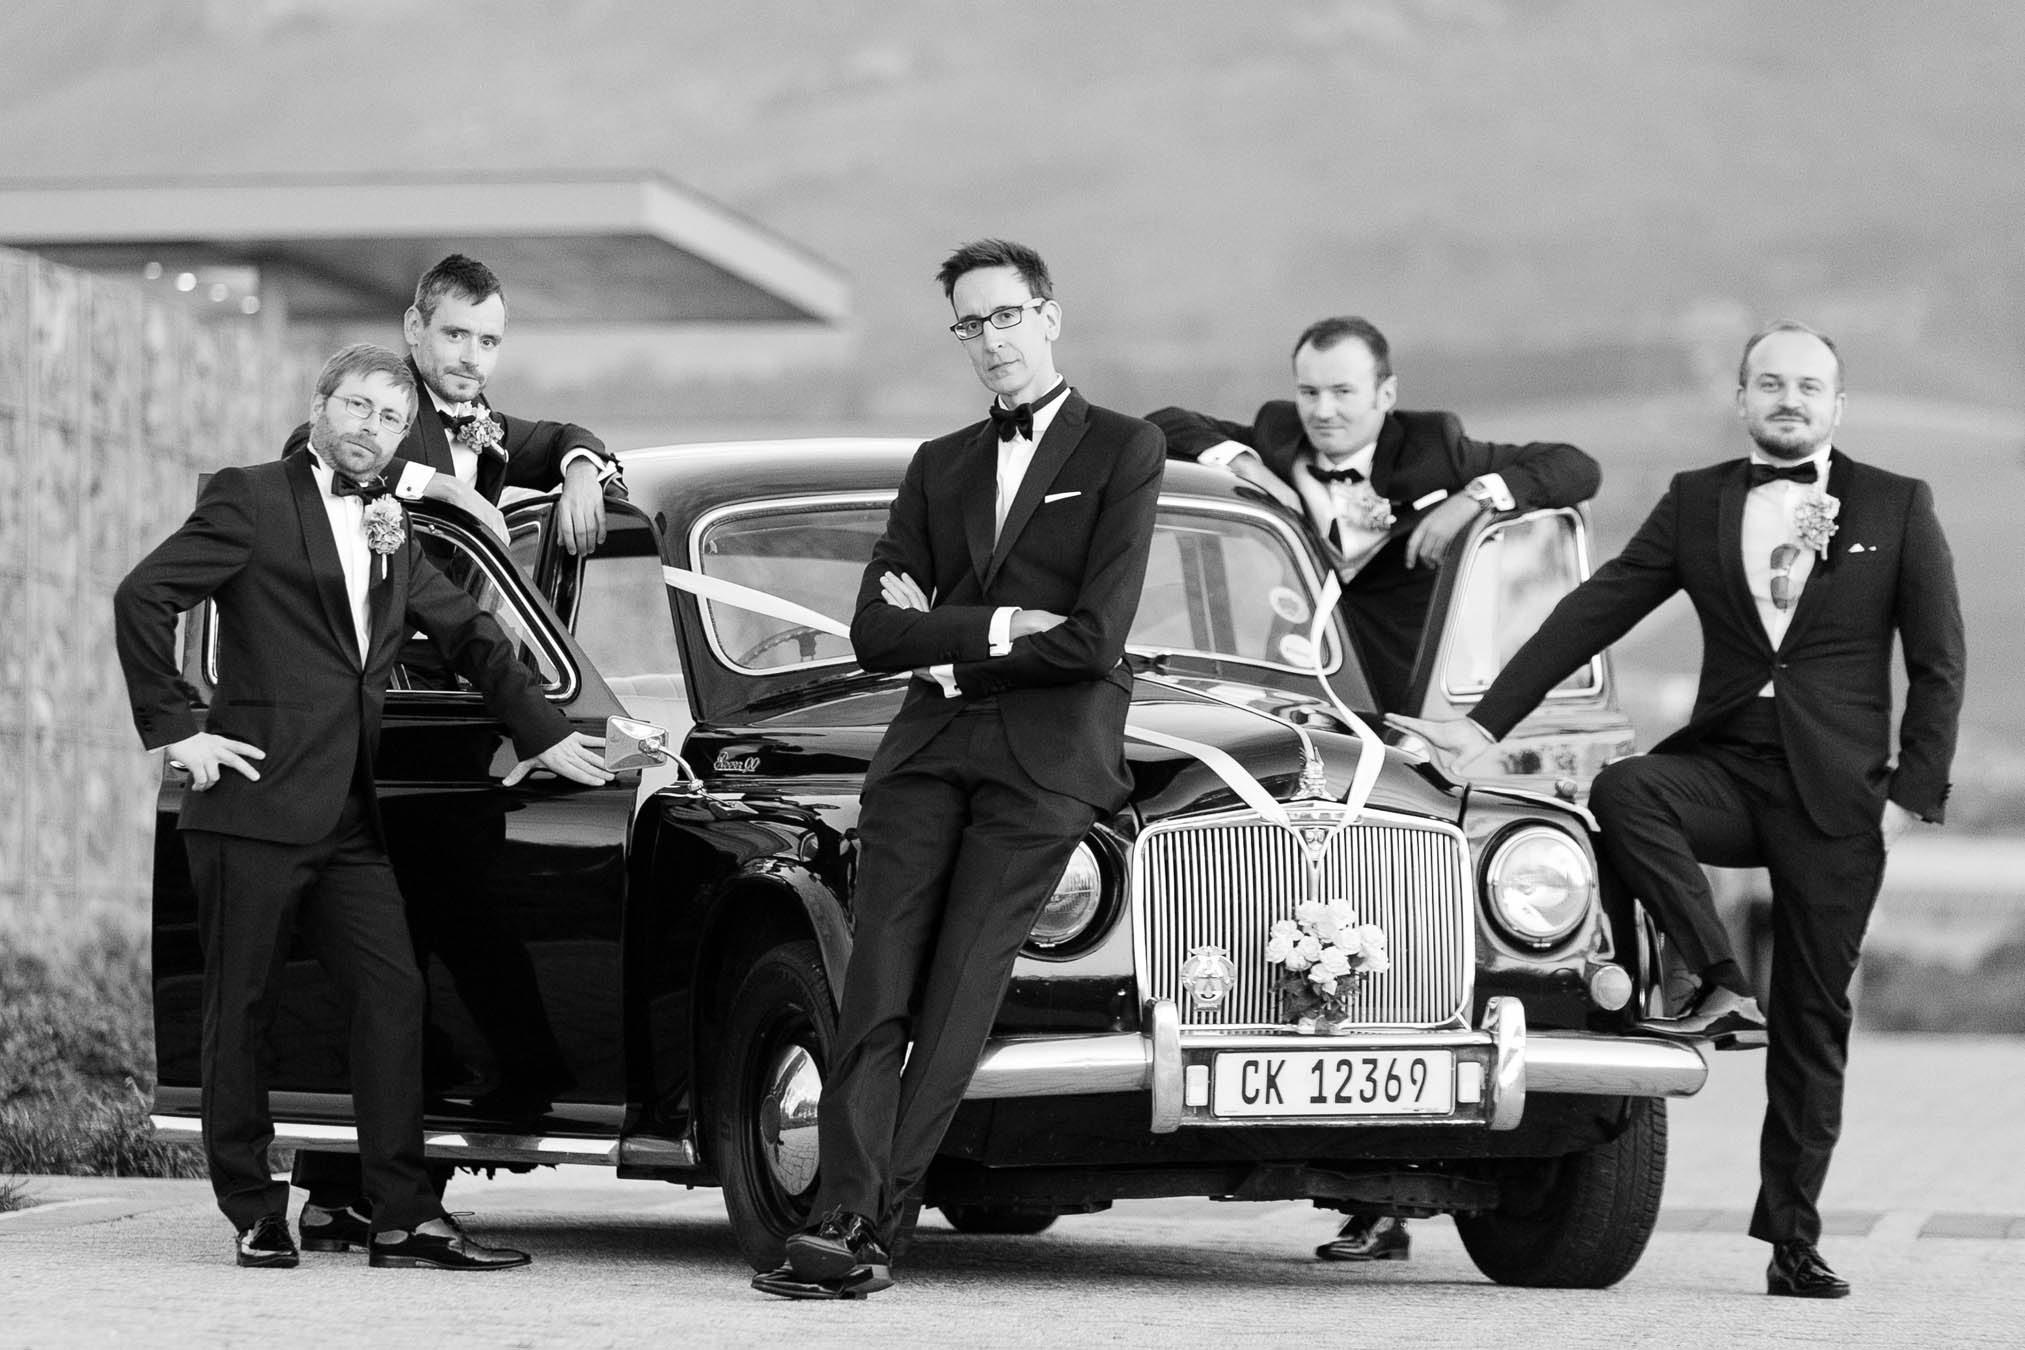 Wedding Photo Tips - Family & Group Shots